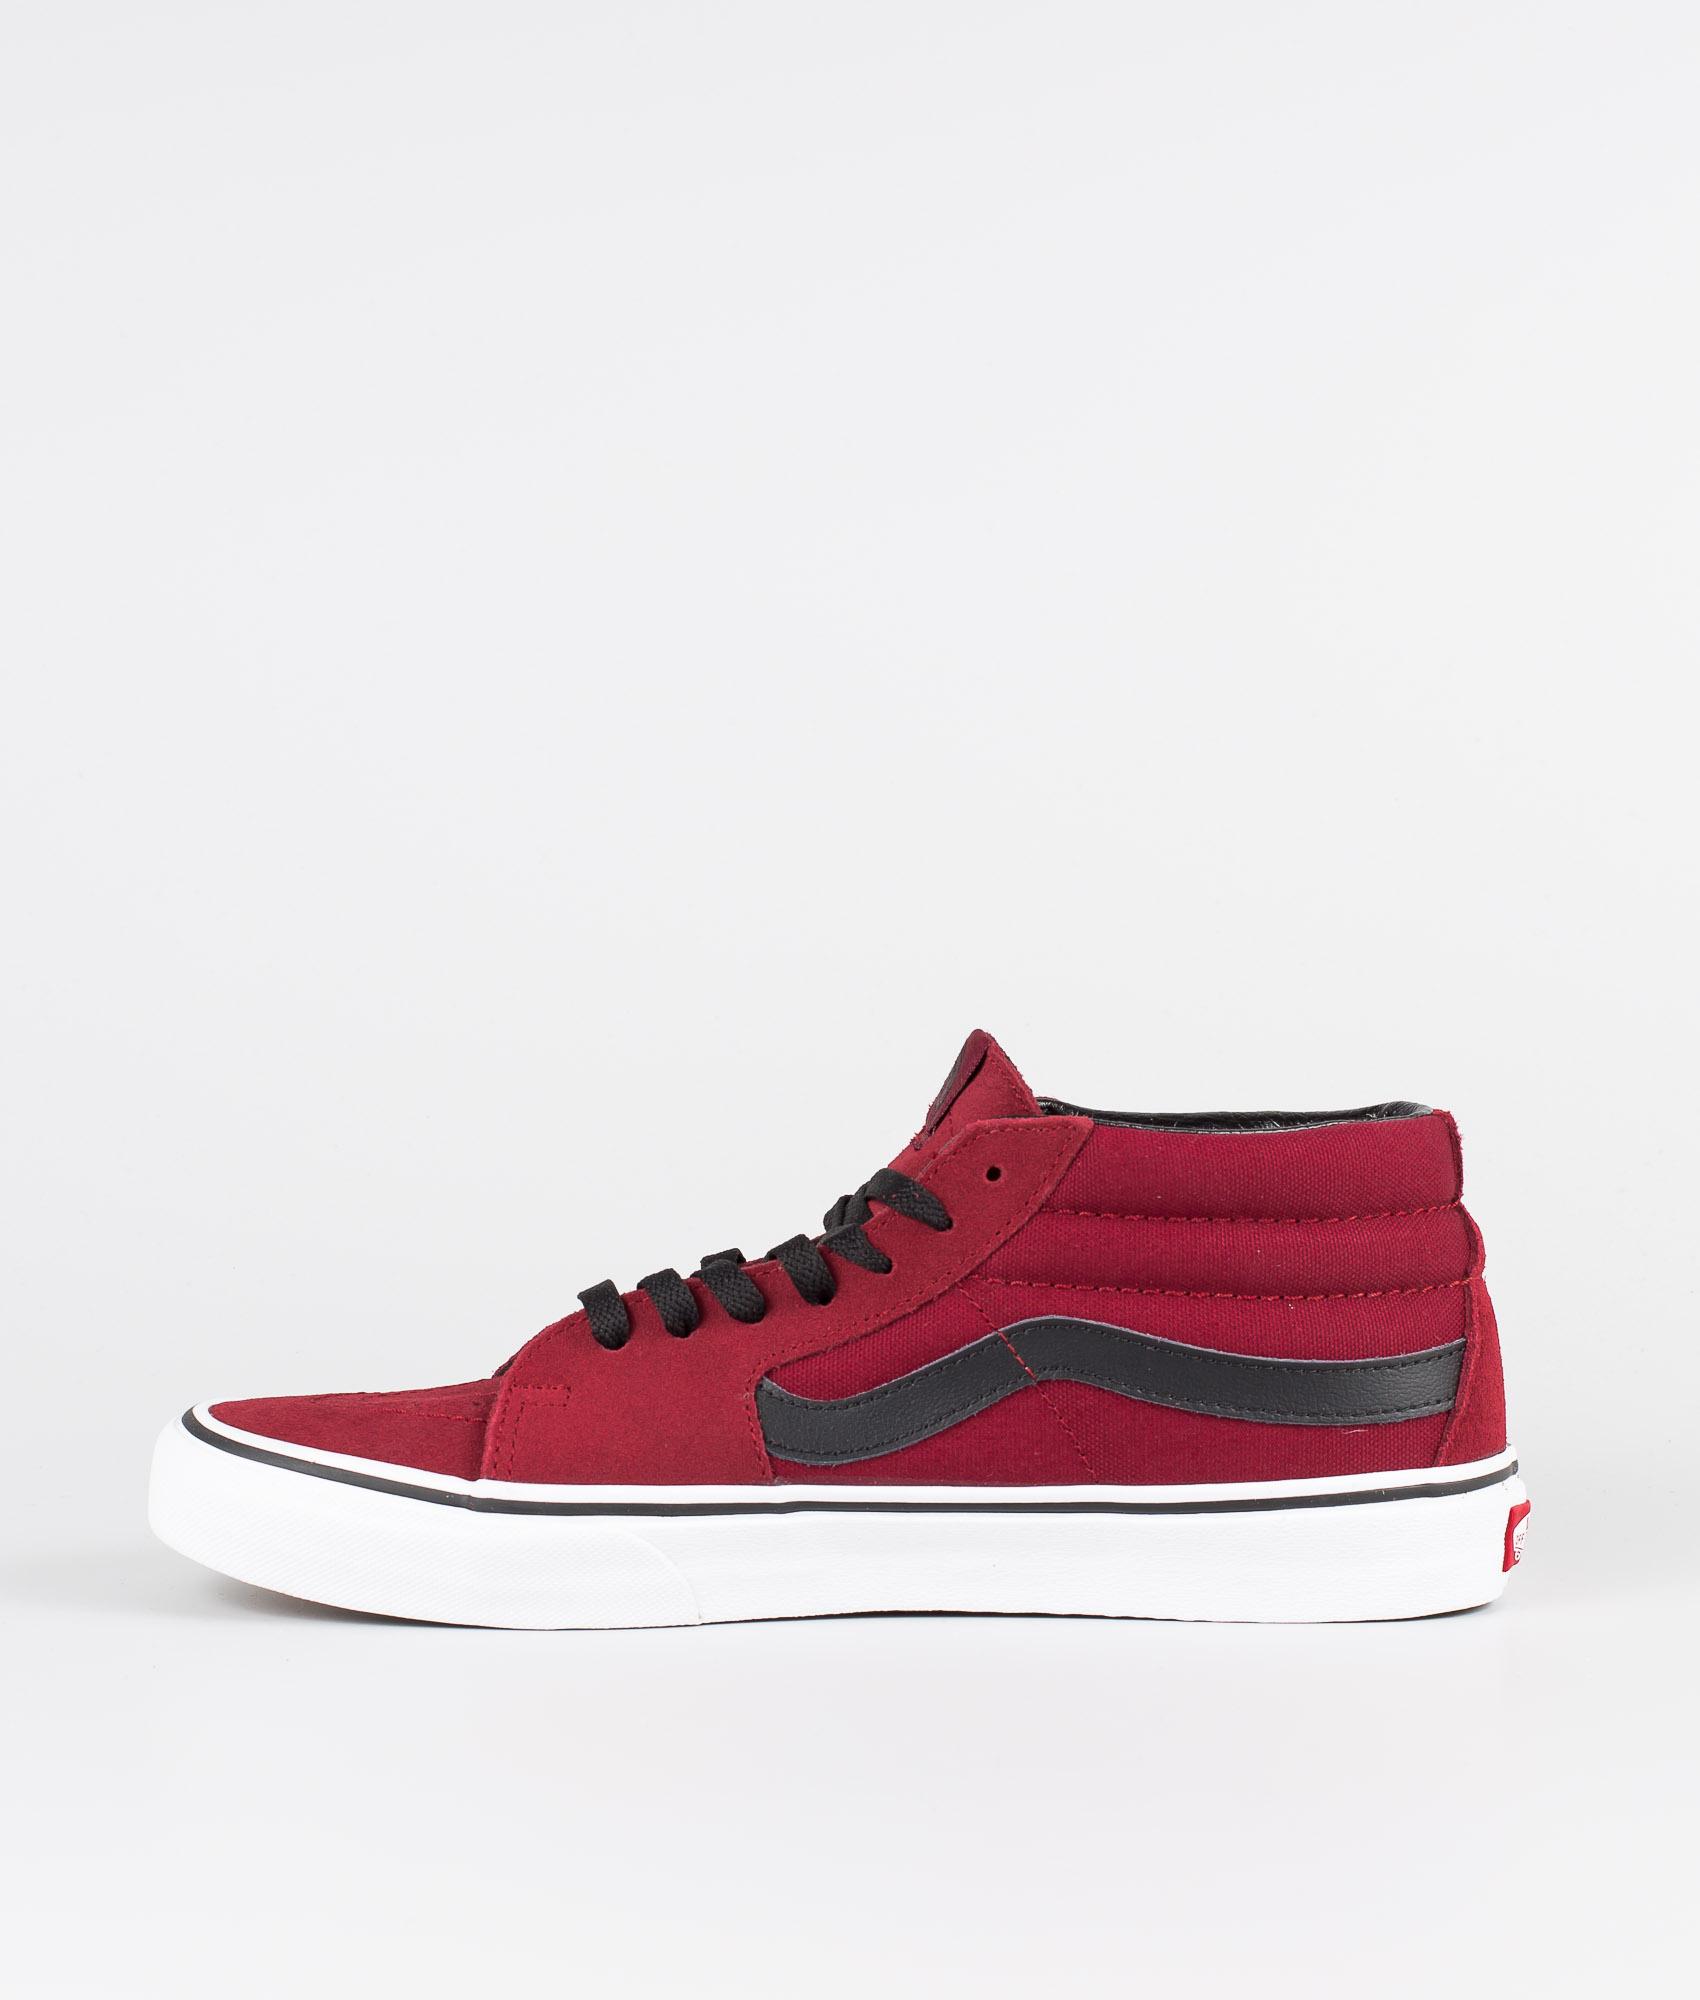 Vans Sk8-Mid Shoes Biking Red/True